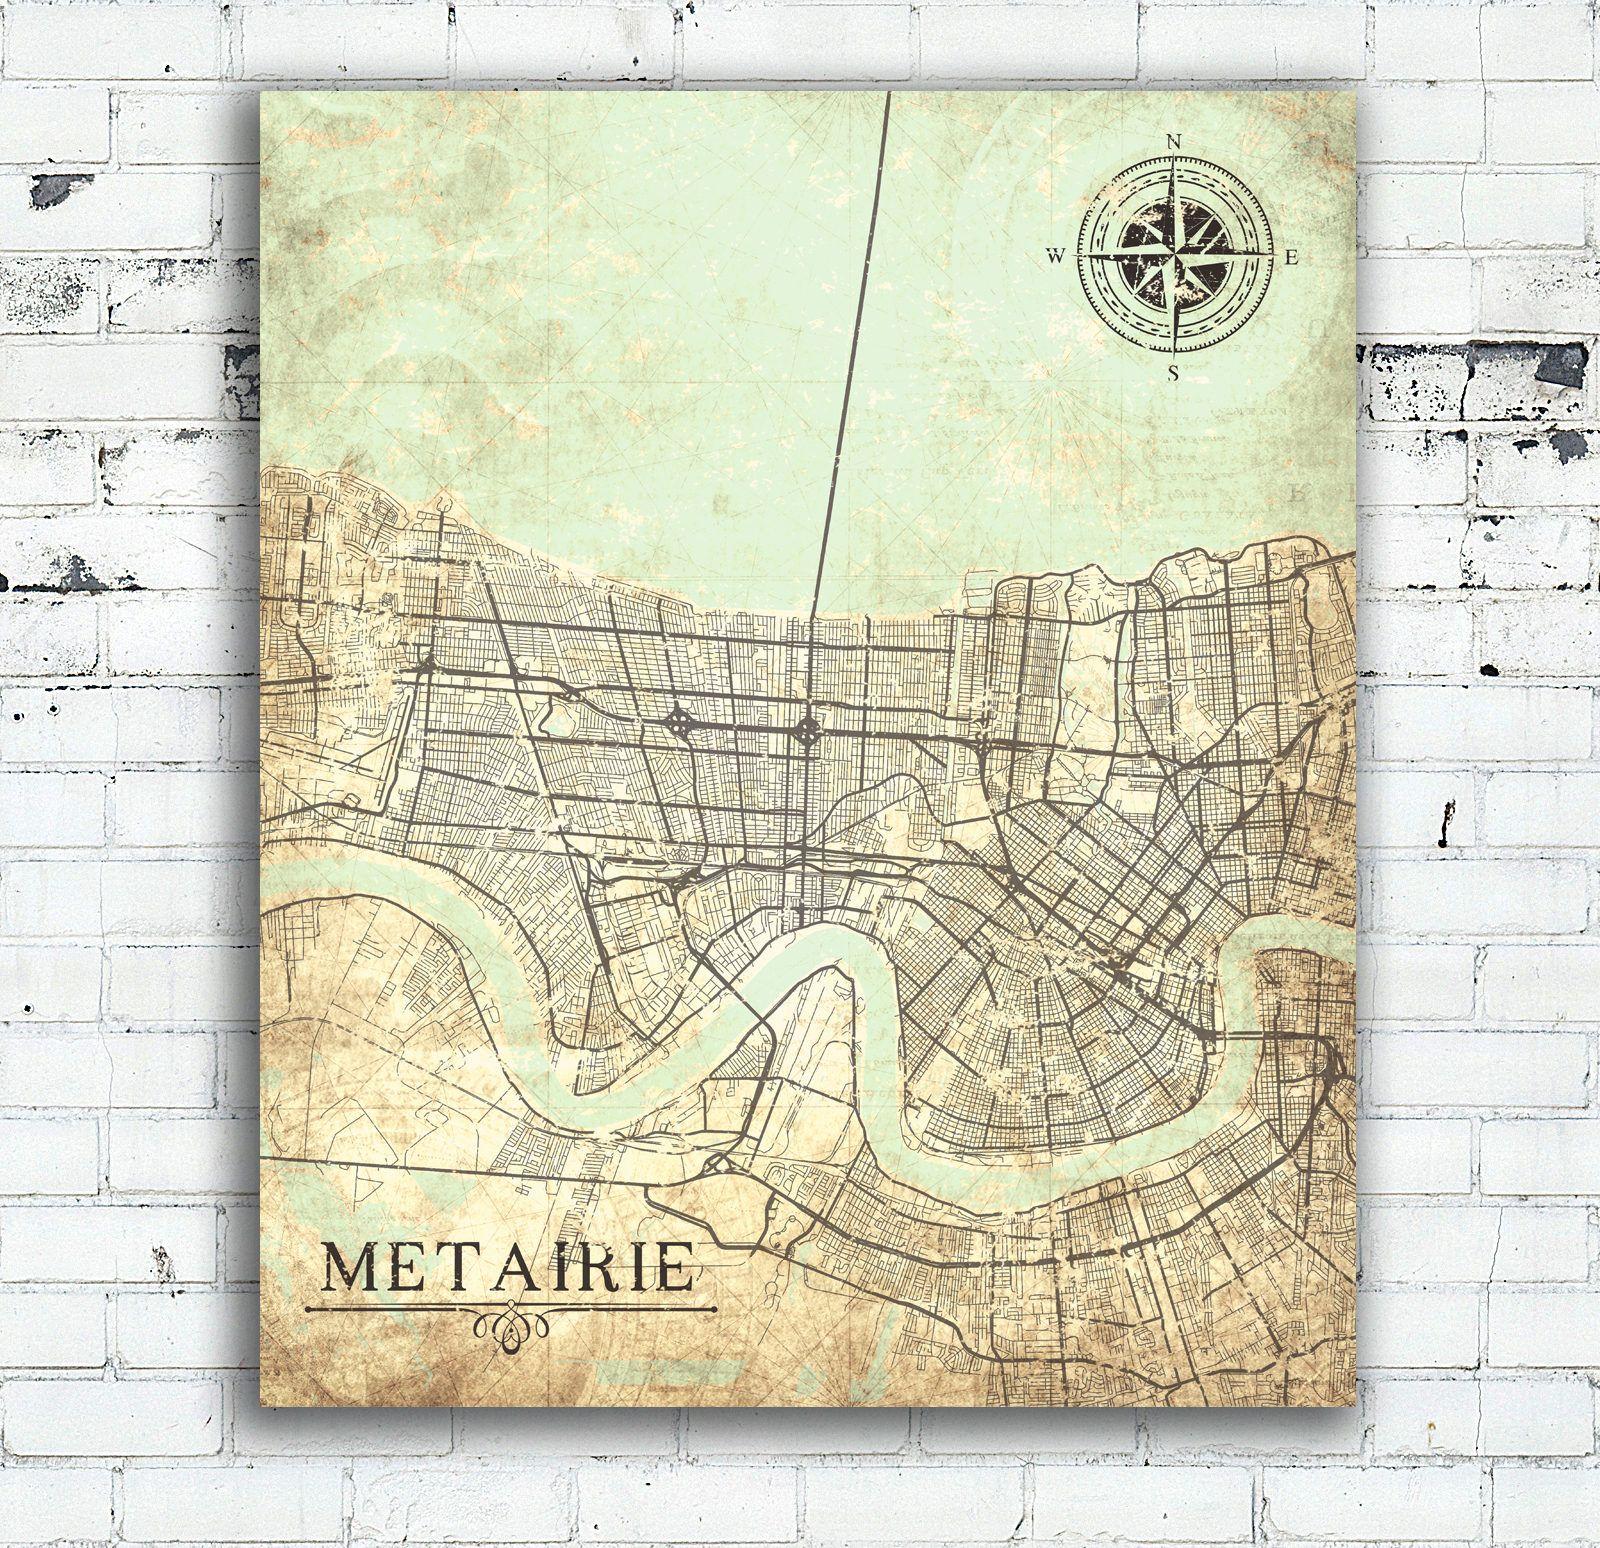 METAIRIE LA Canvas Print Louisiana City Vintage map Teal Aqua Mint